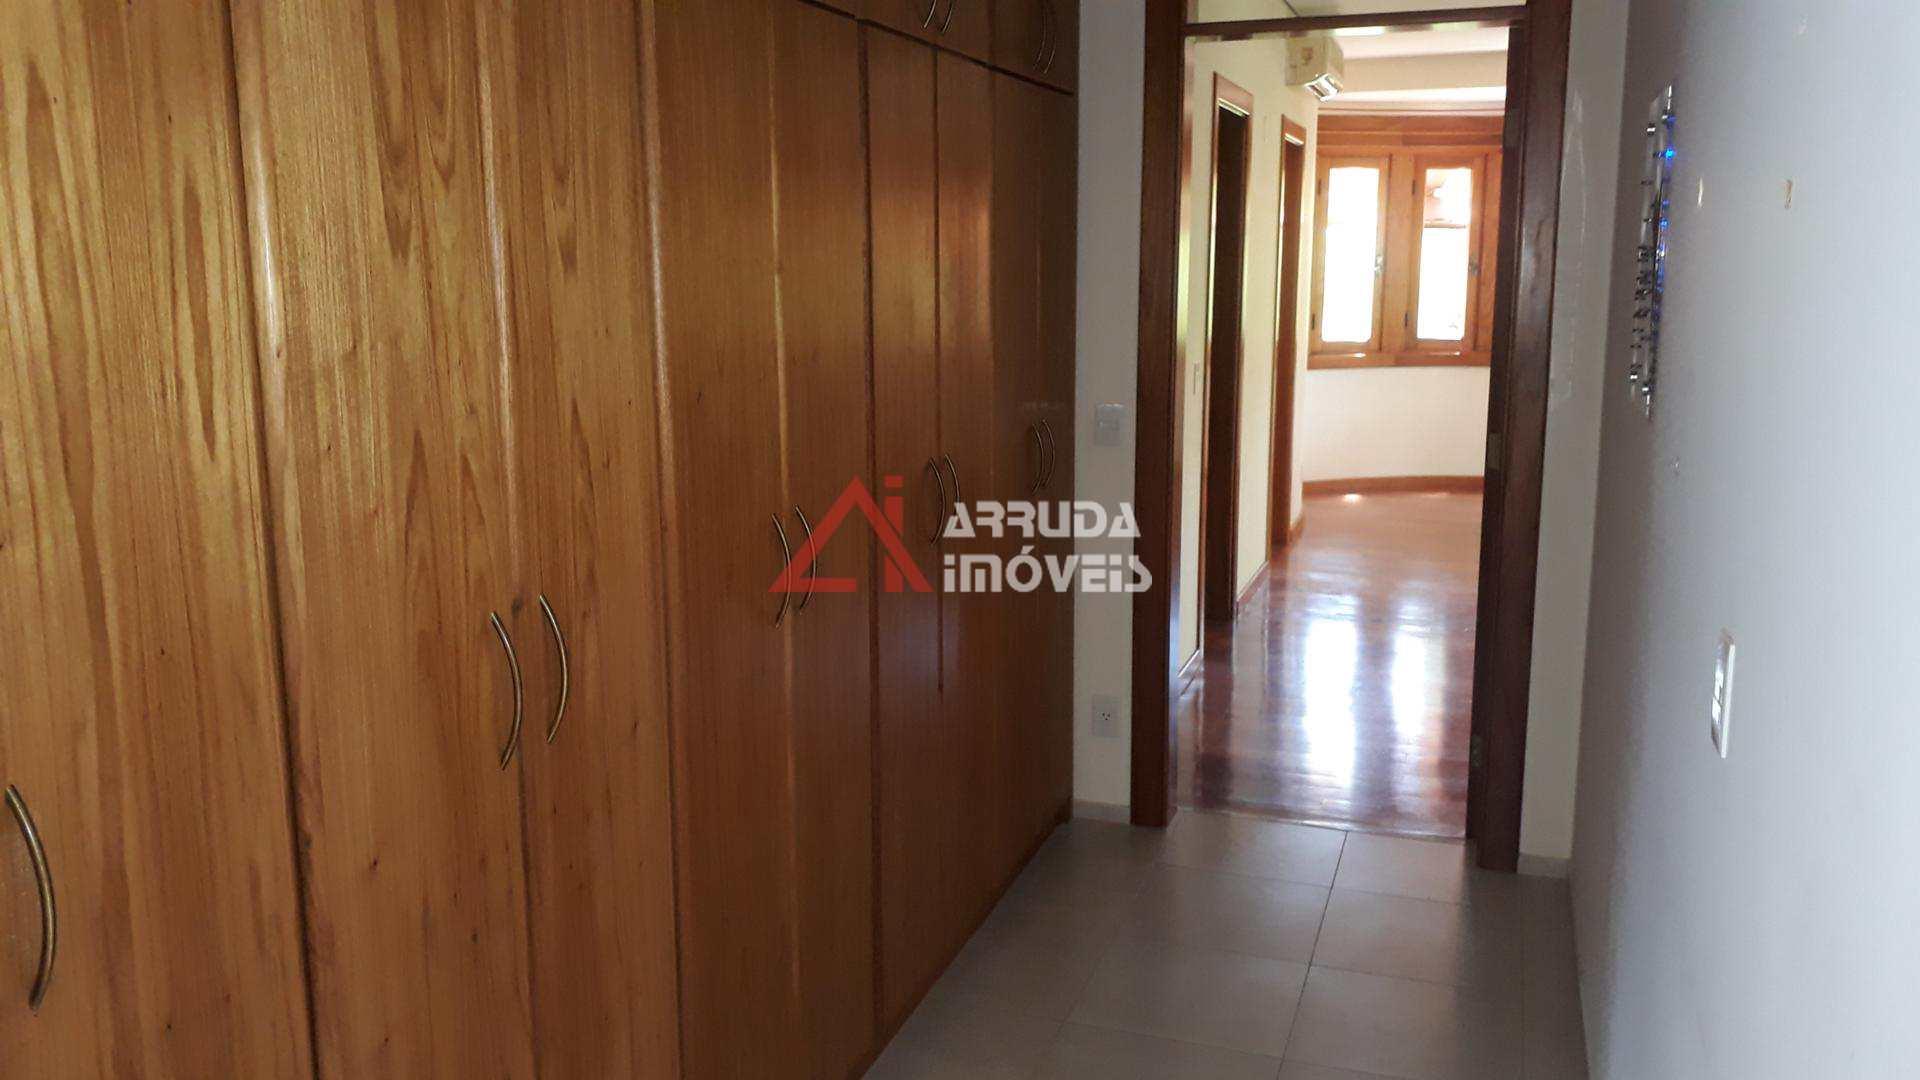 Casa de Condomínio com 5 dorms, Condomínio Terras de São José, Itu - R$ 4.5 mi, Cod: 42507